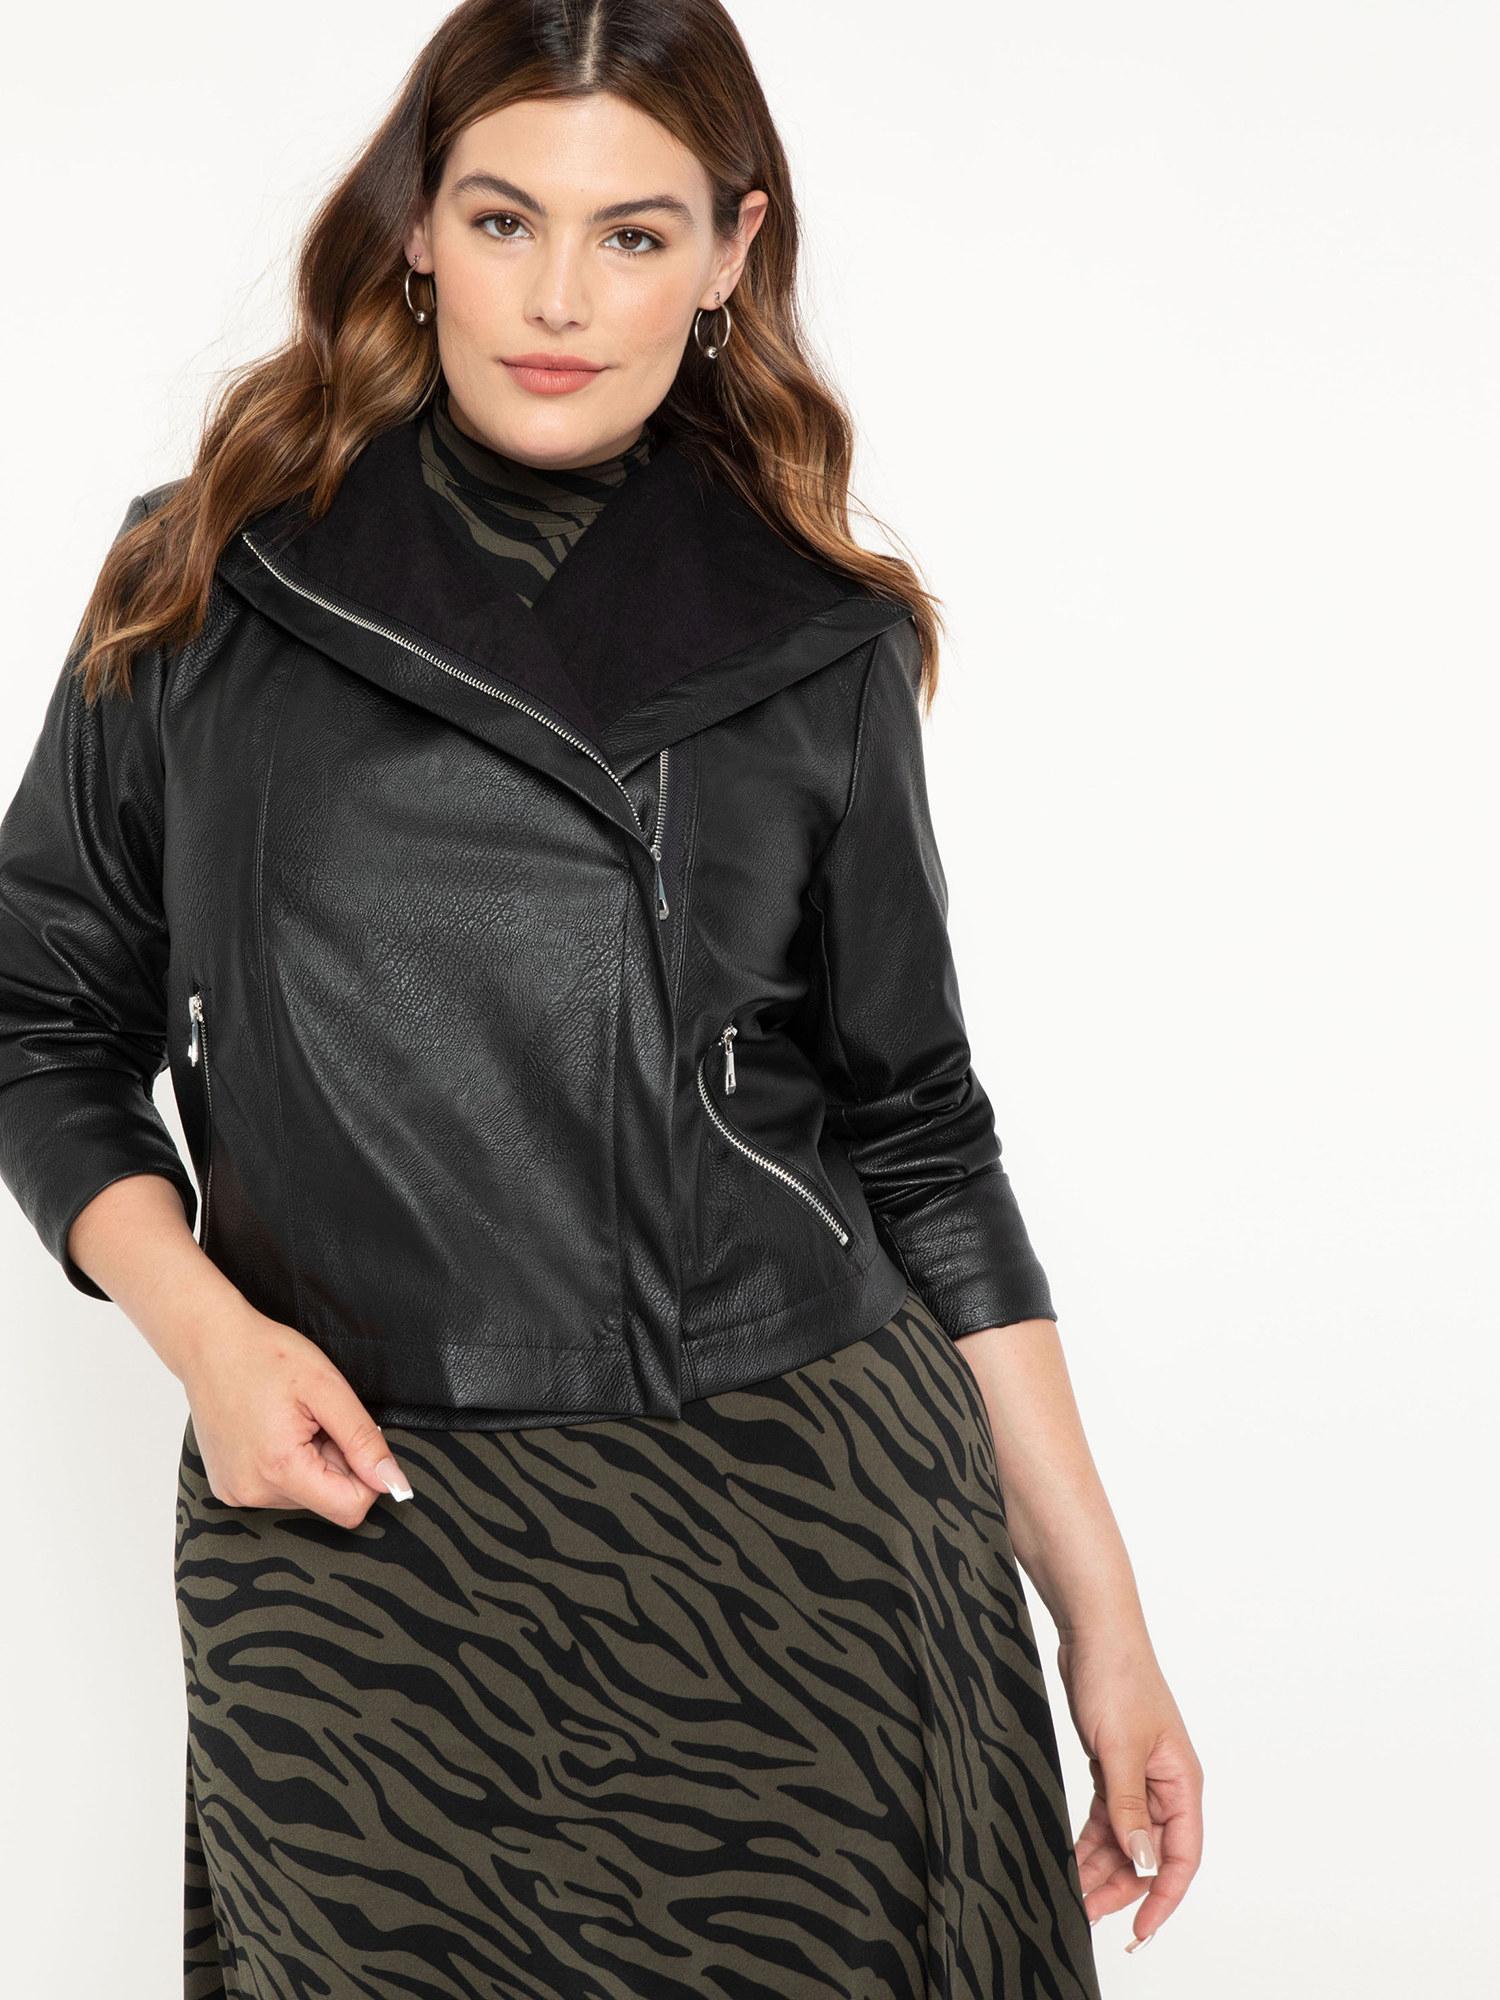 model wearing black shawl coat